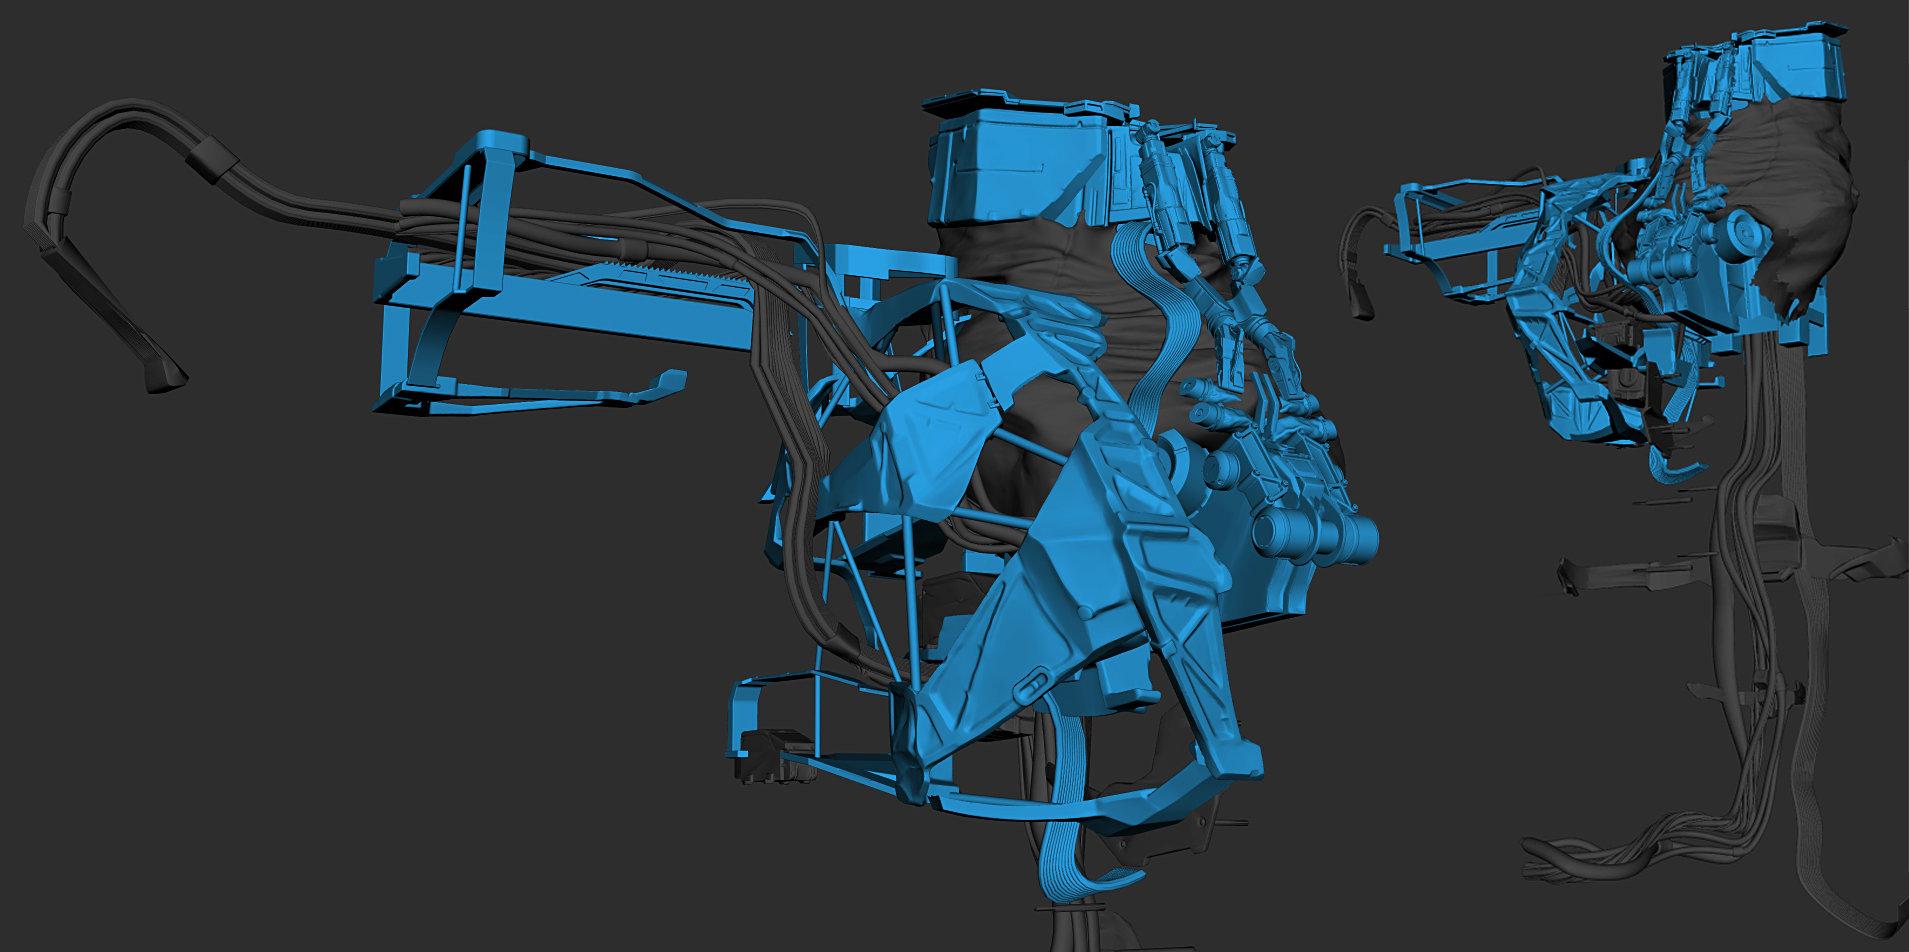 Romain chauliac assembly of parts